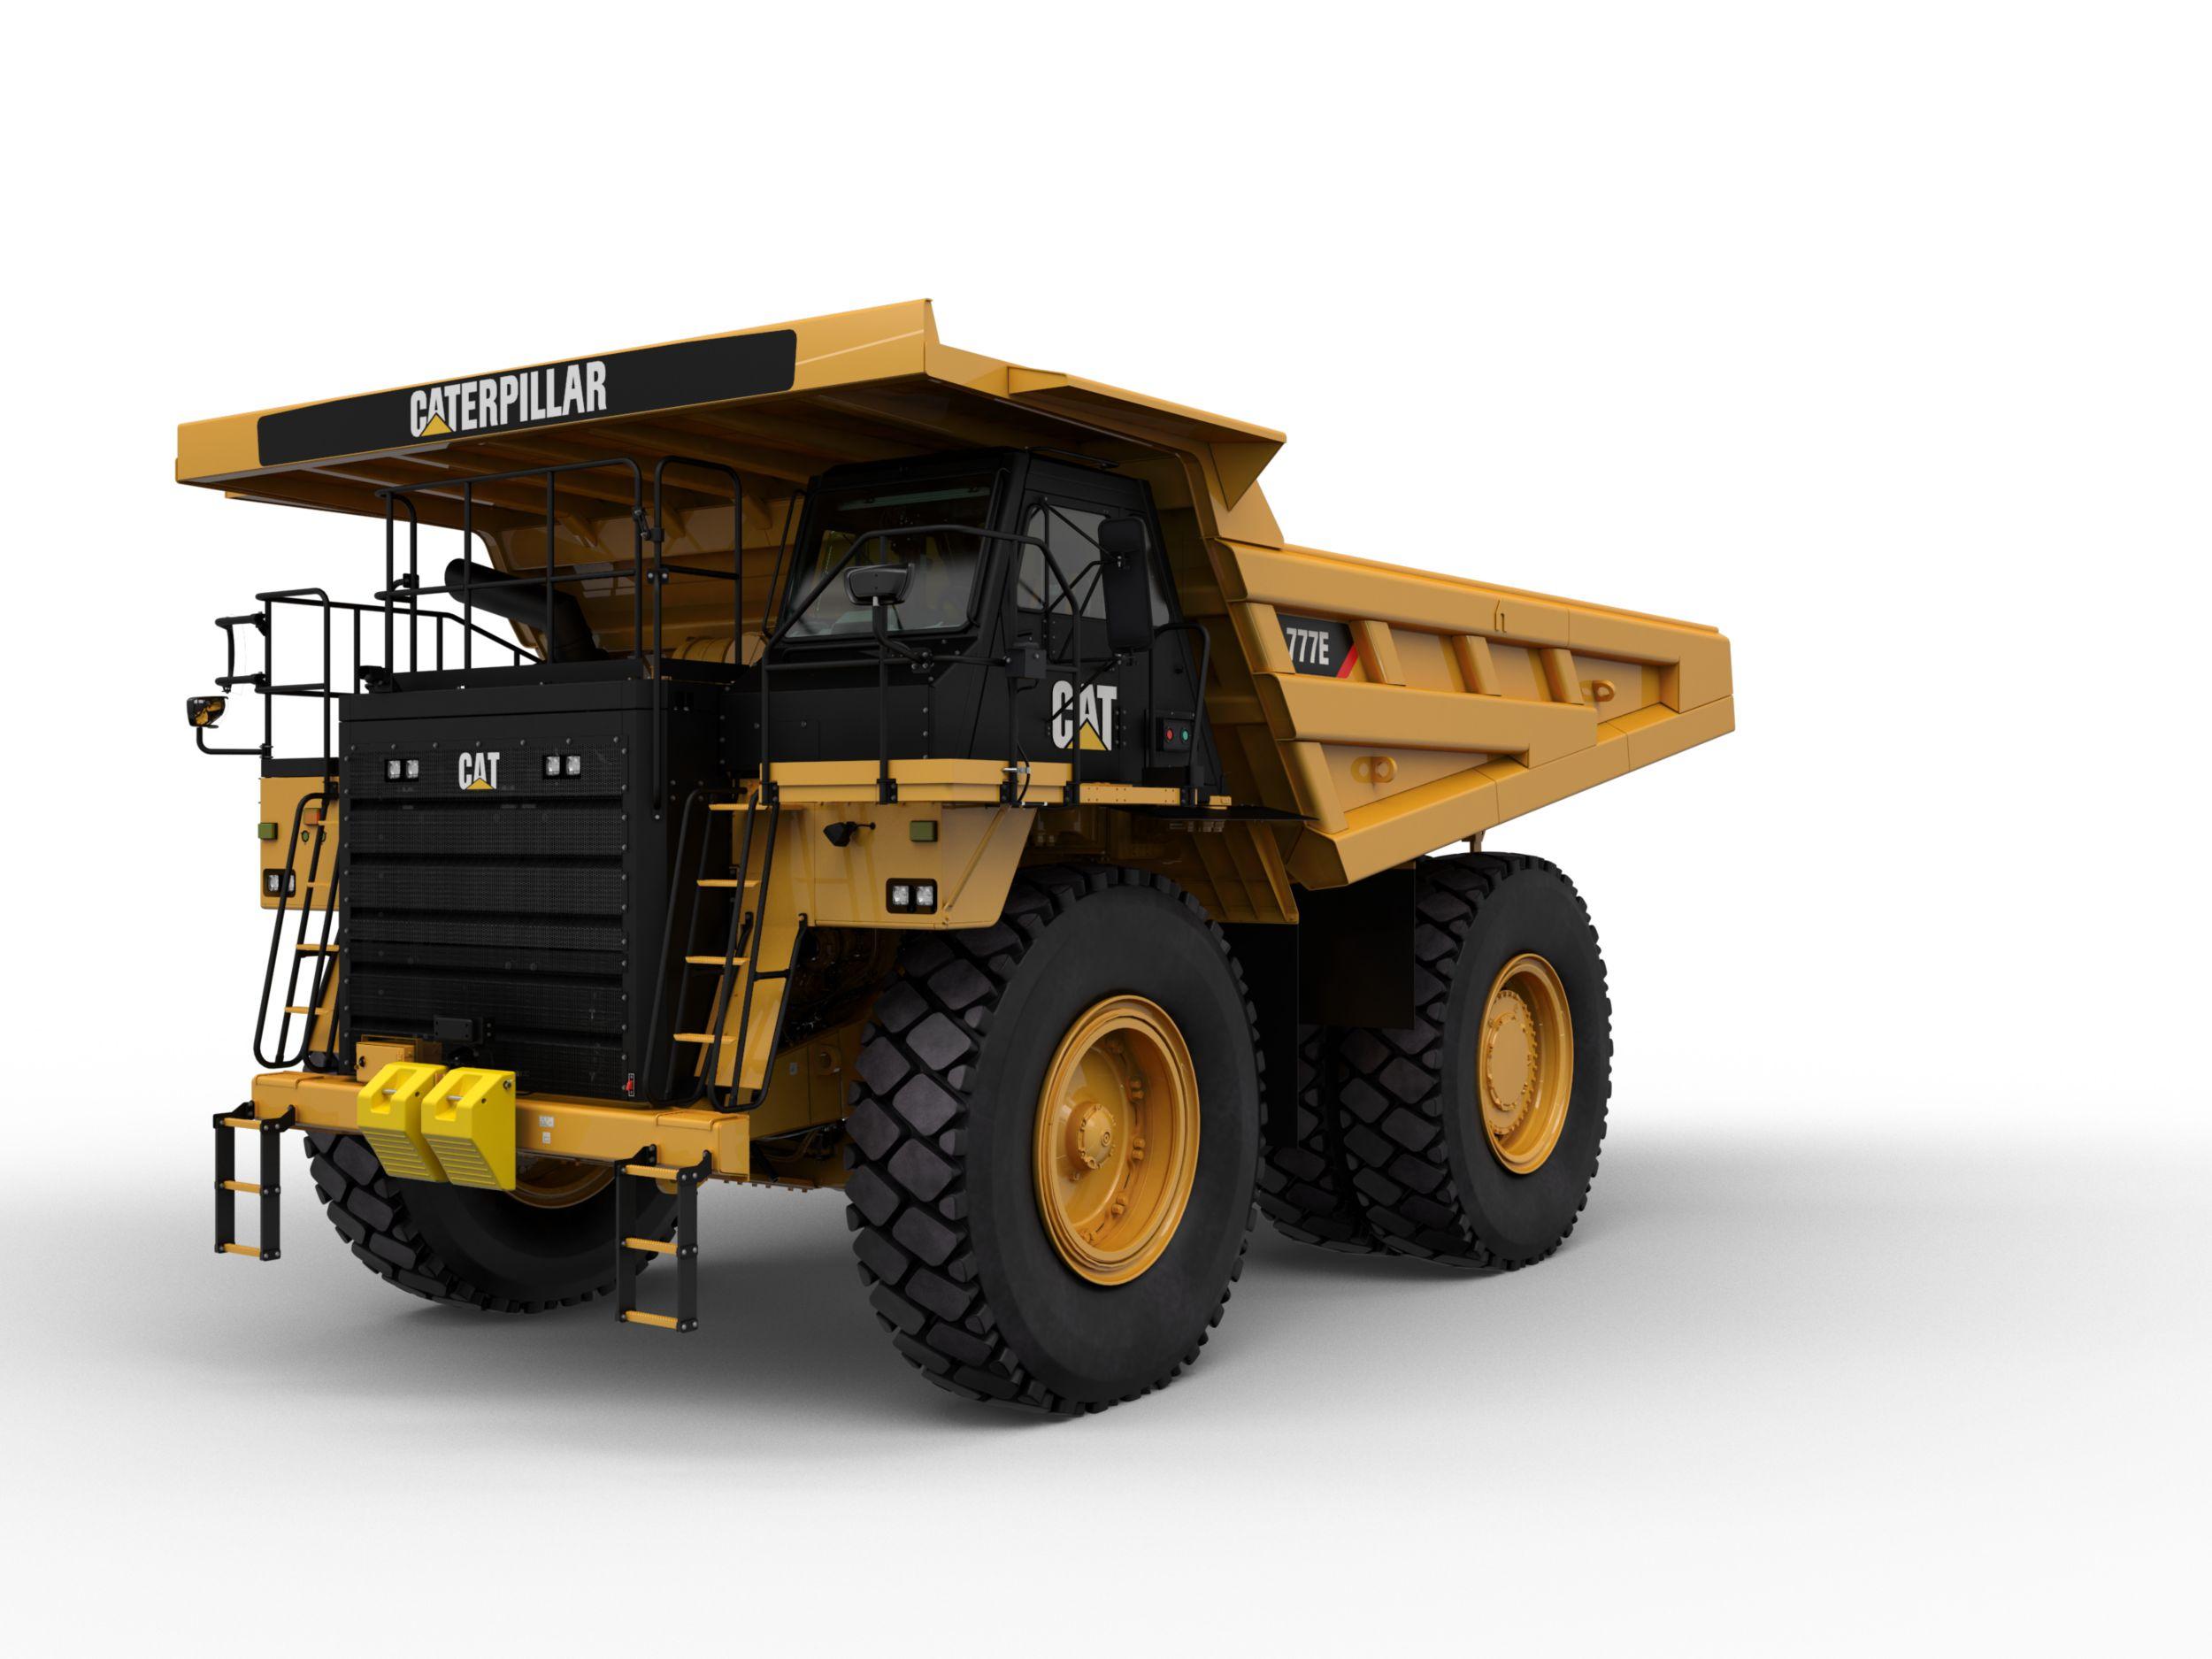 detroit series 60 ecm wiring diagram levels data flow cat off highway trucks road dump caterpillar 777e